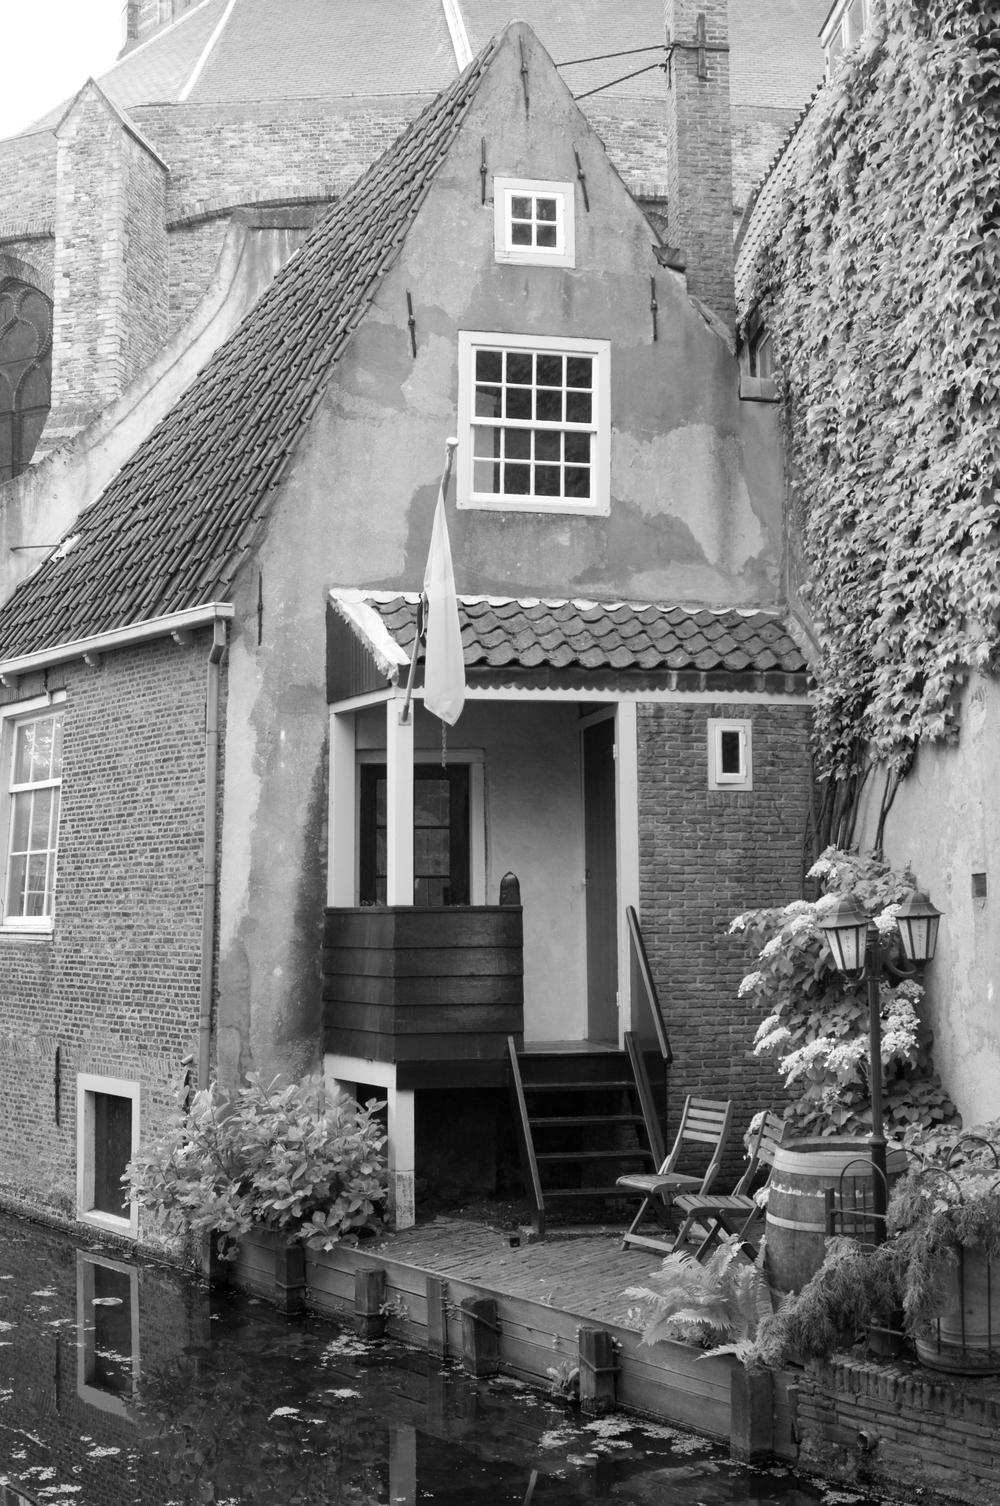 TheVermeerJump_Delft_6429.jpg